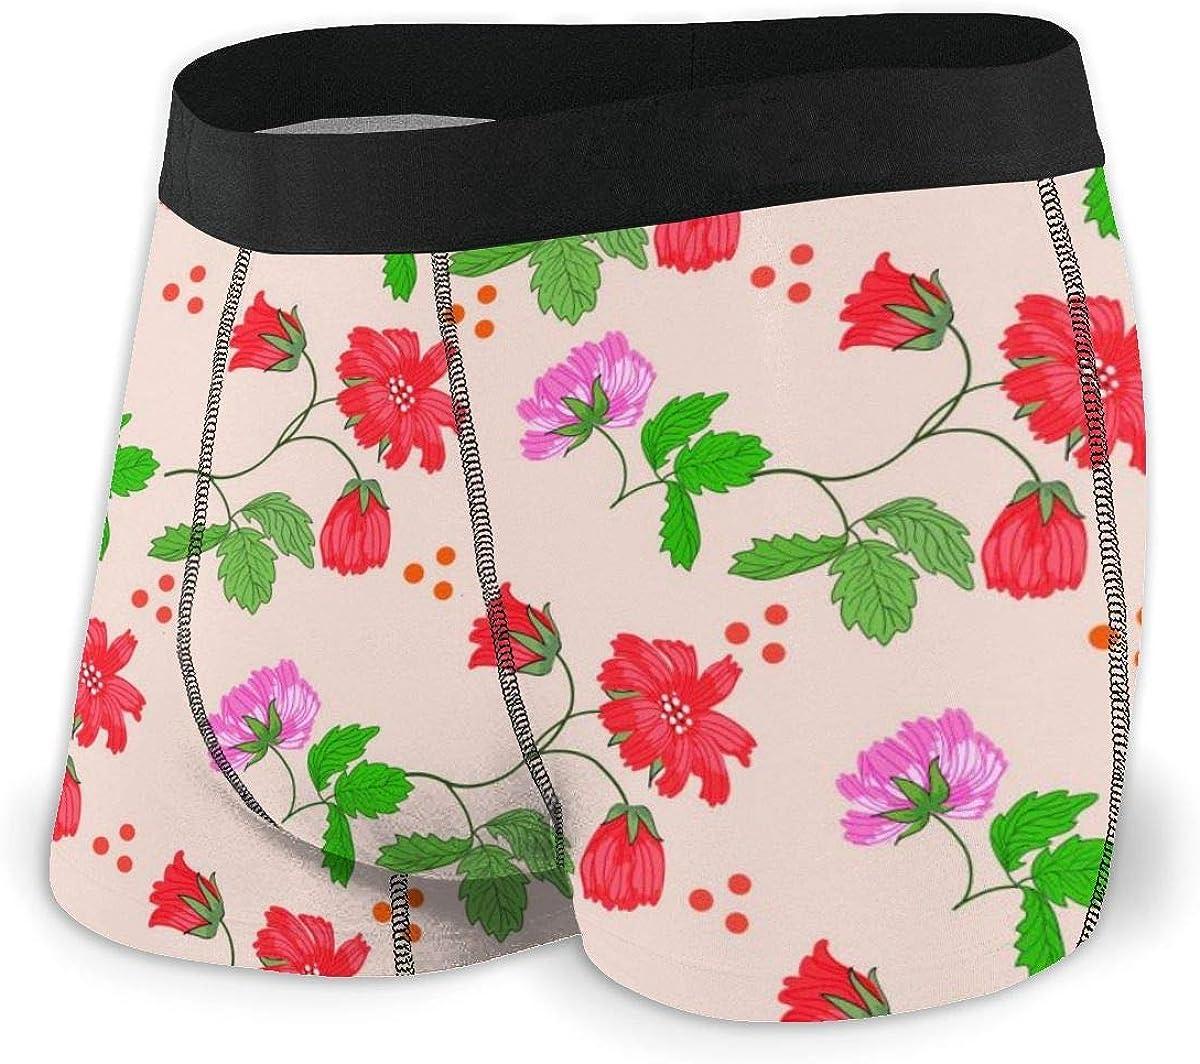 Mens Boxer Briefs Red Floral Beautiful Cute Flowers Bikini Underwear Stretch Low Rise Trunks Boys Underpants